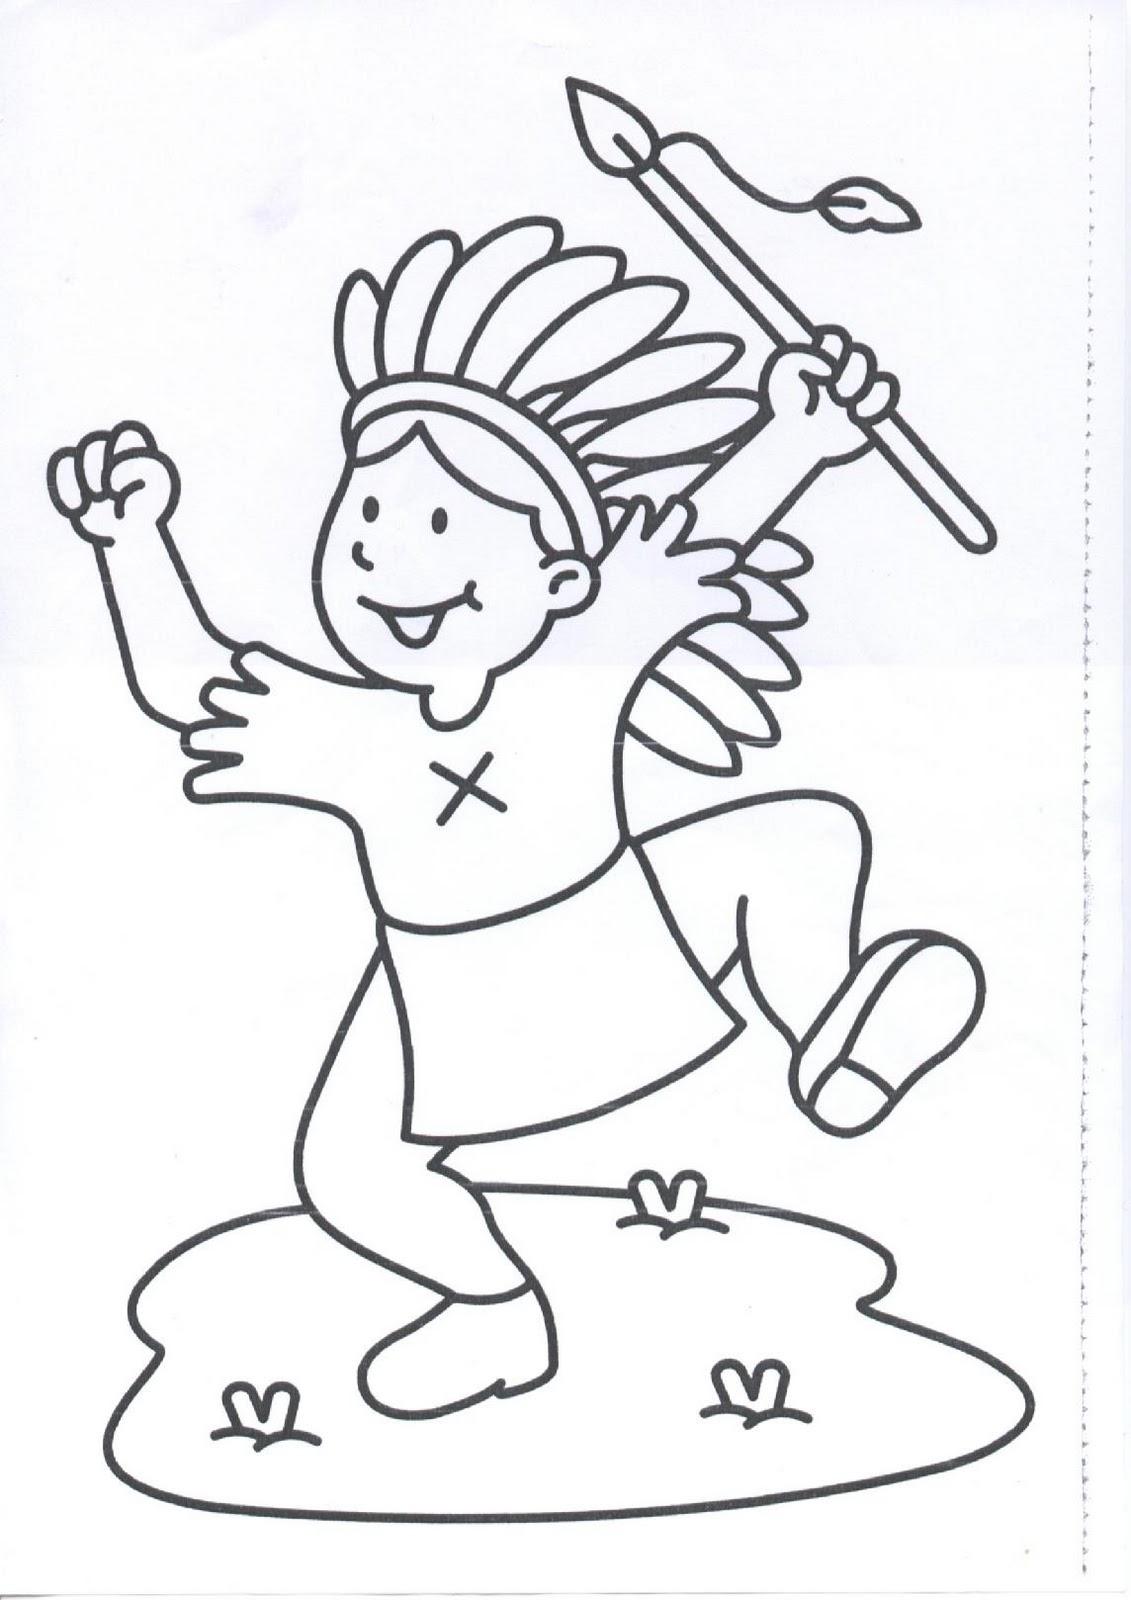 Mi colecci n de dibujos indios dibujos para colorear - Pasos para pintar ...